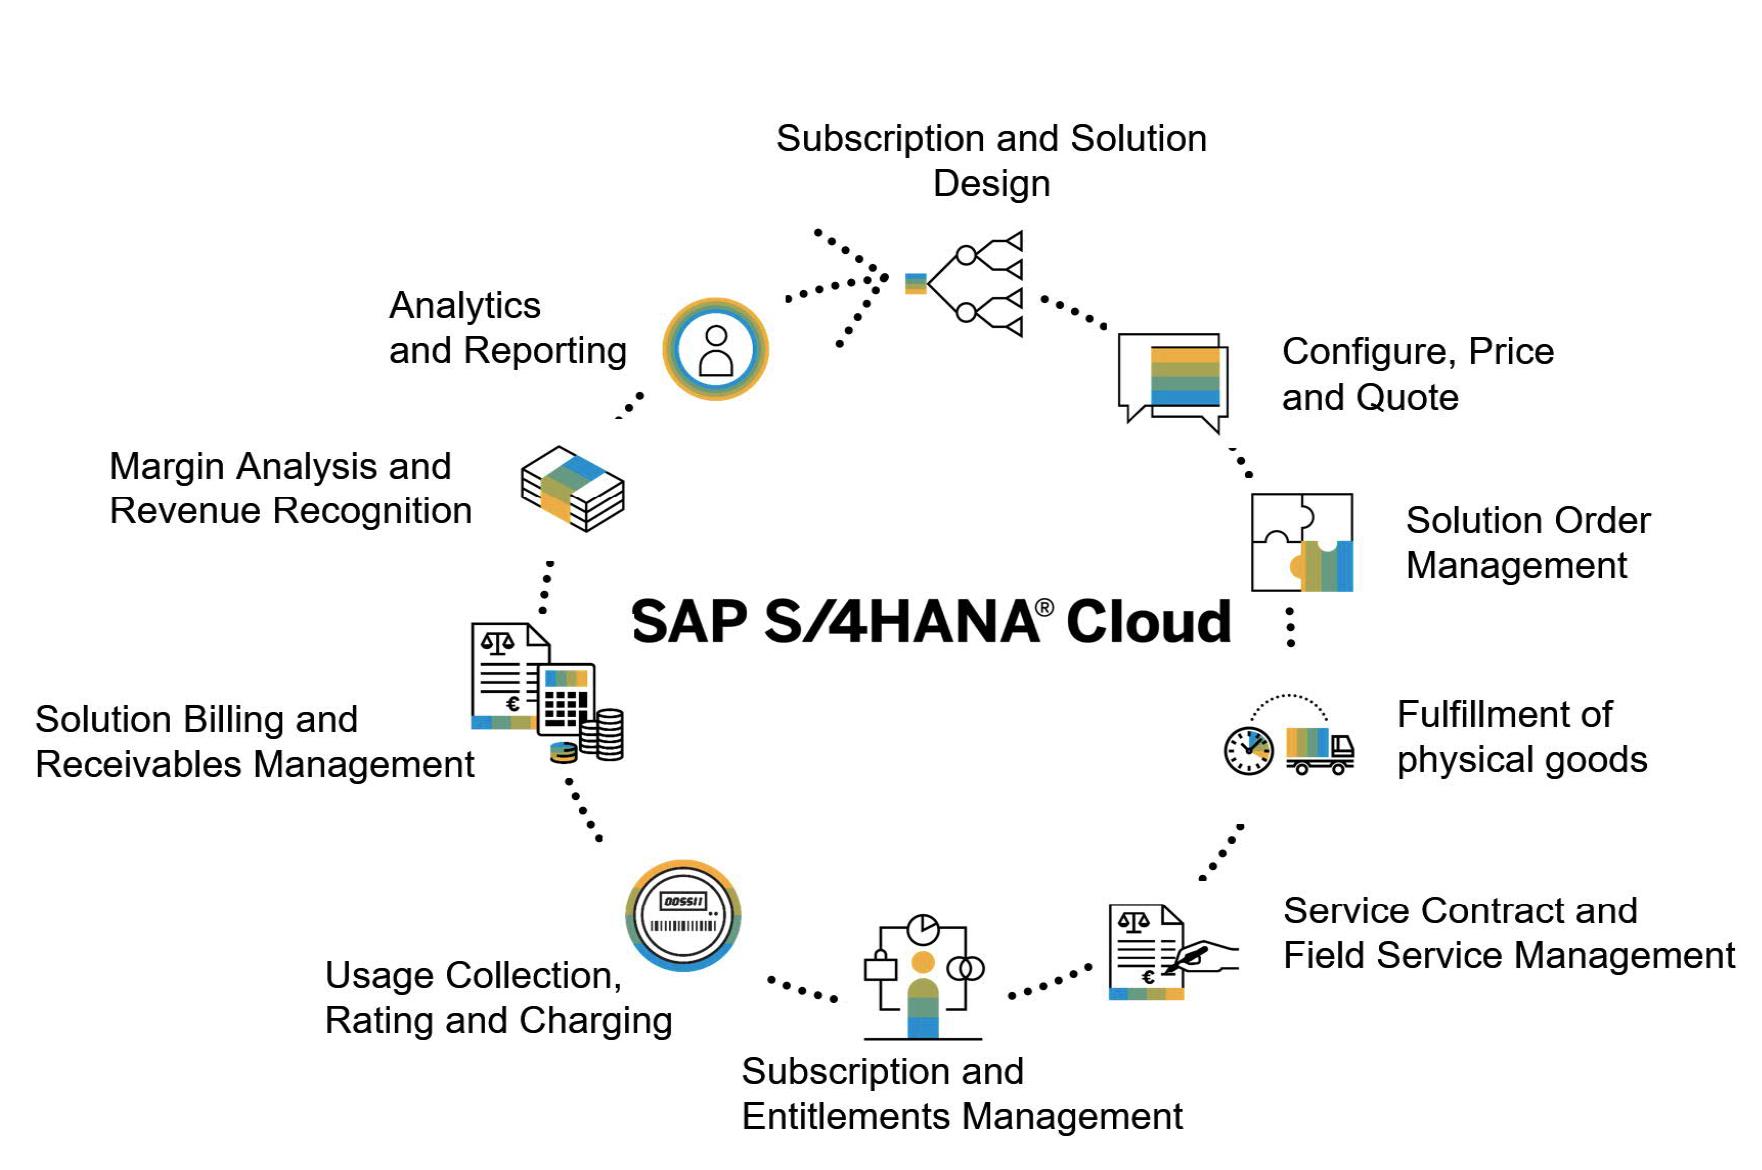 Subscription Business met SAP S/4HANA Cloud